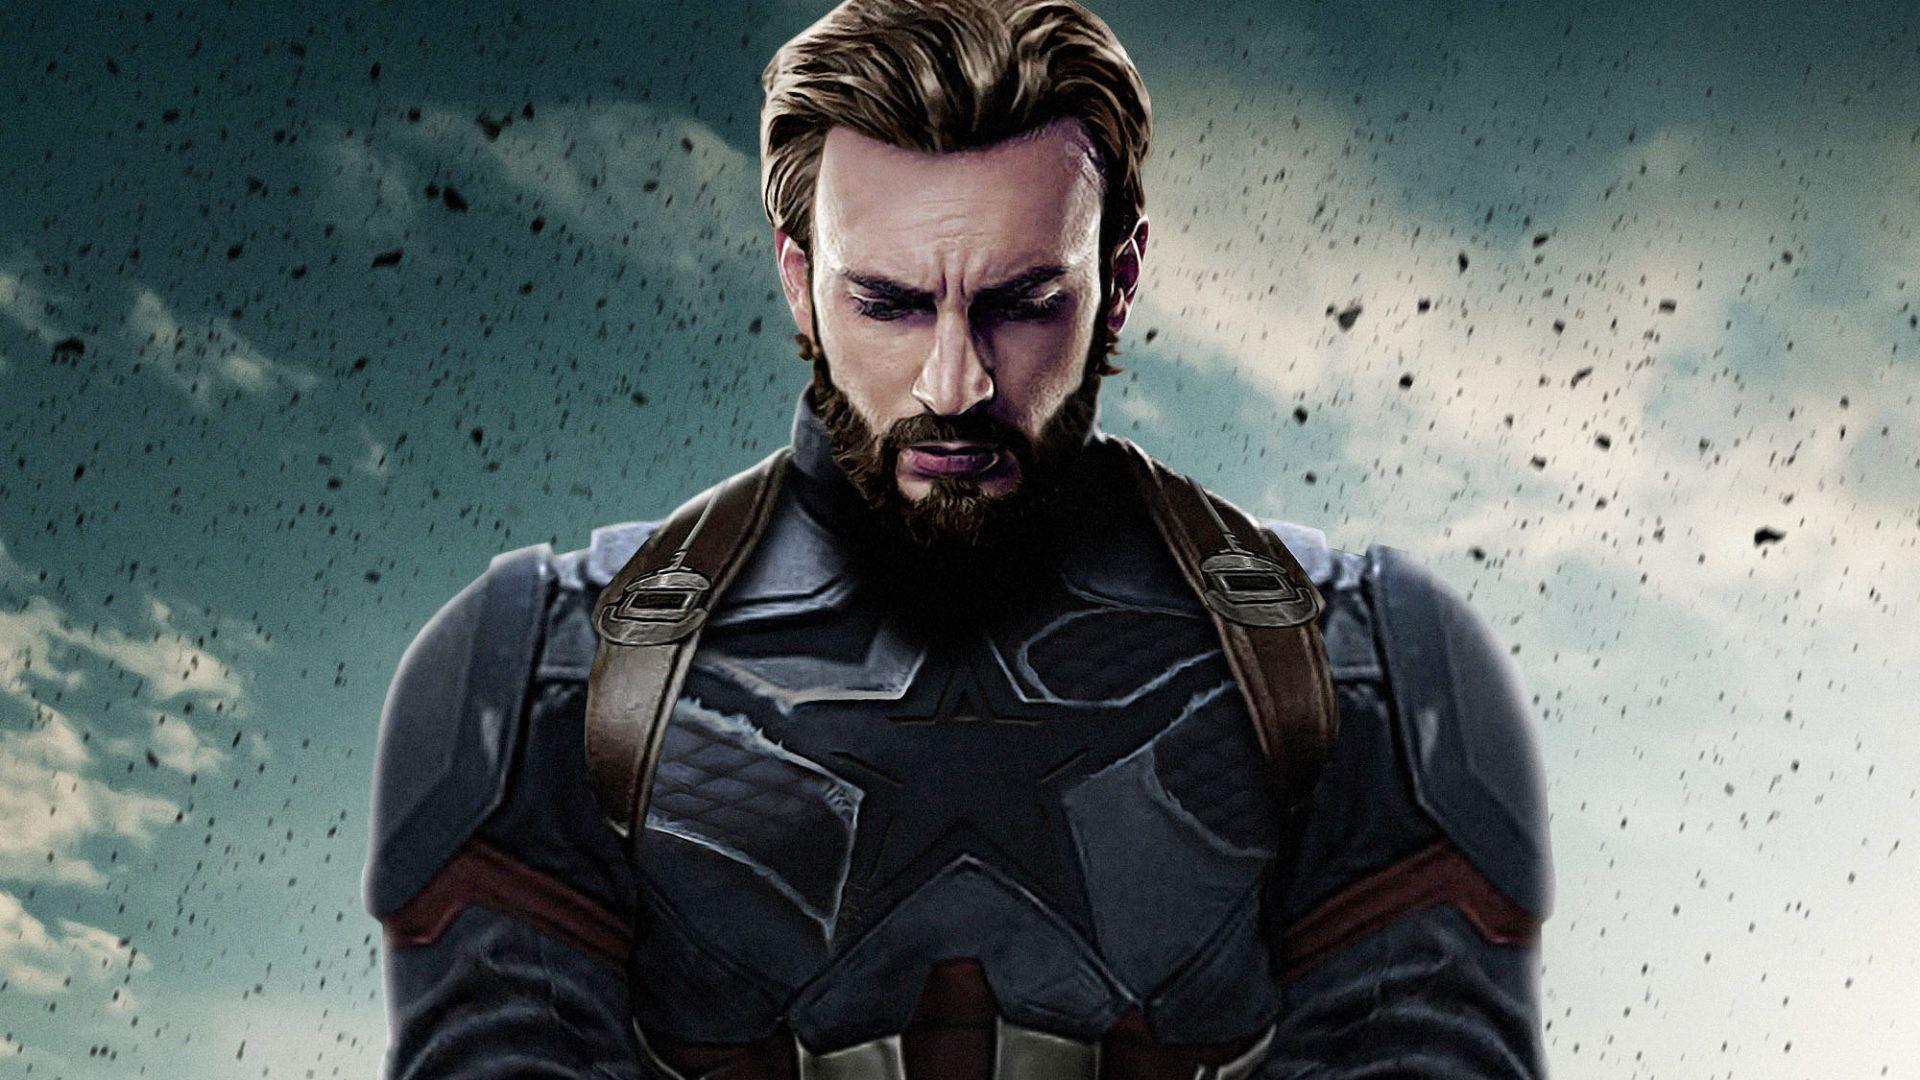 Captain America Infinity War Hd Wallpapers